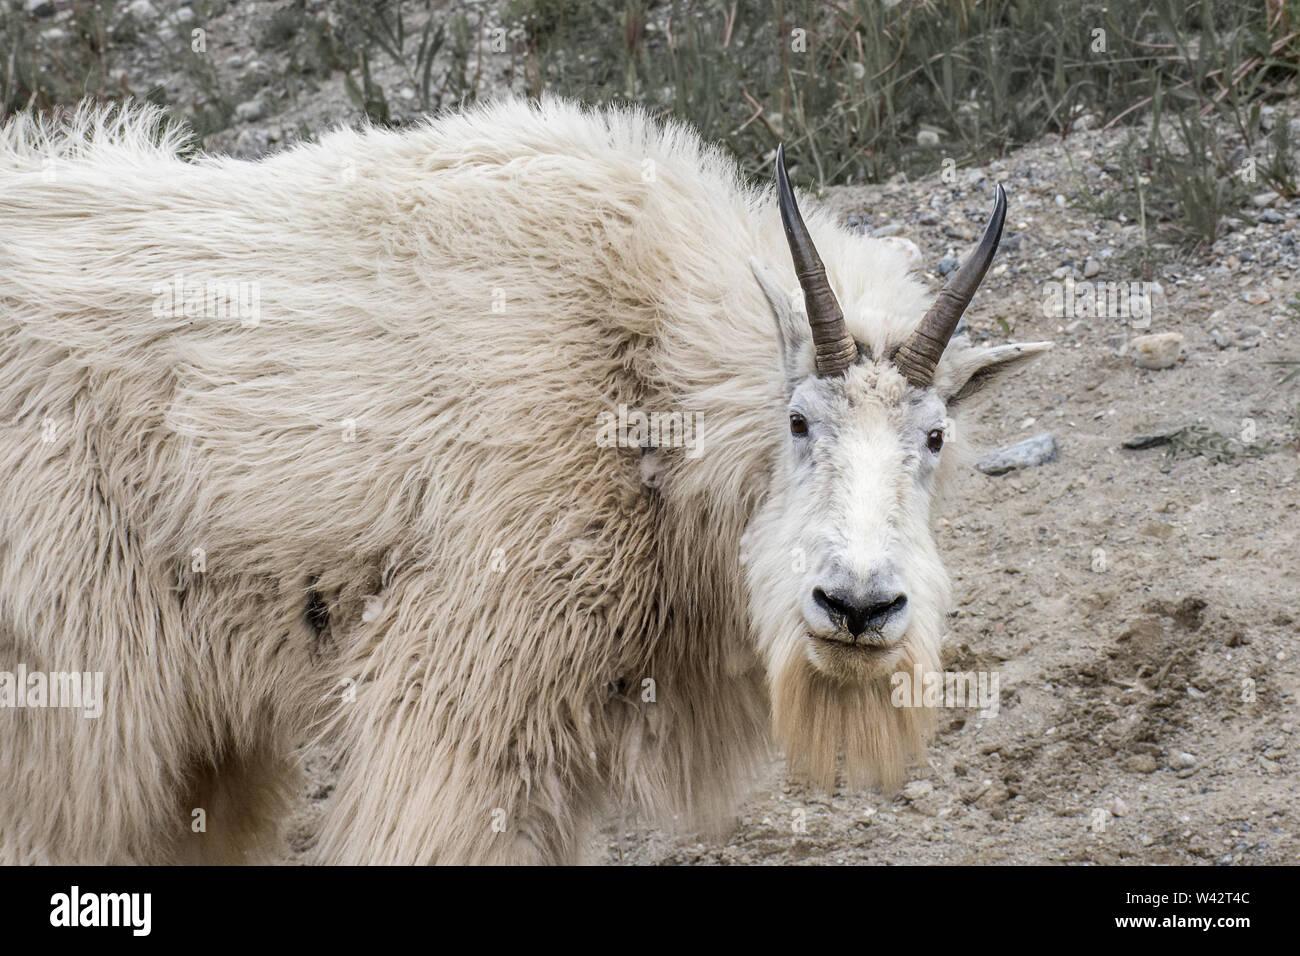 Mountain Goat - Stock Image